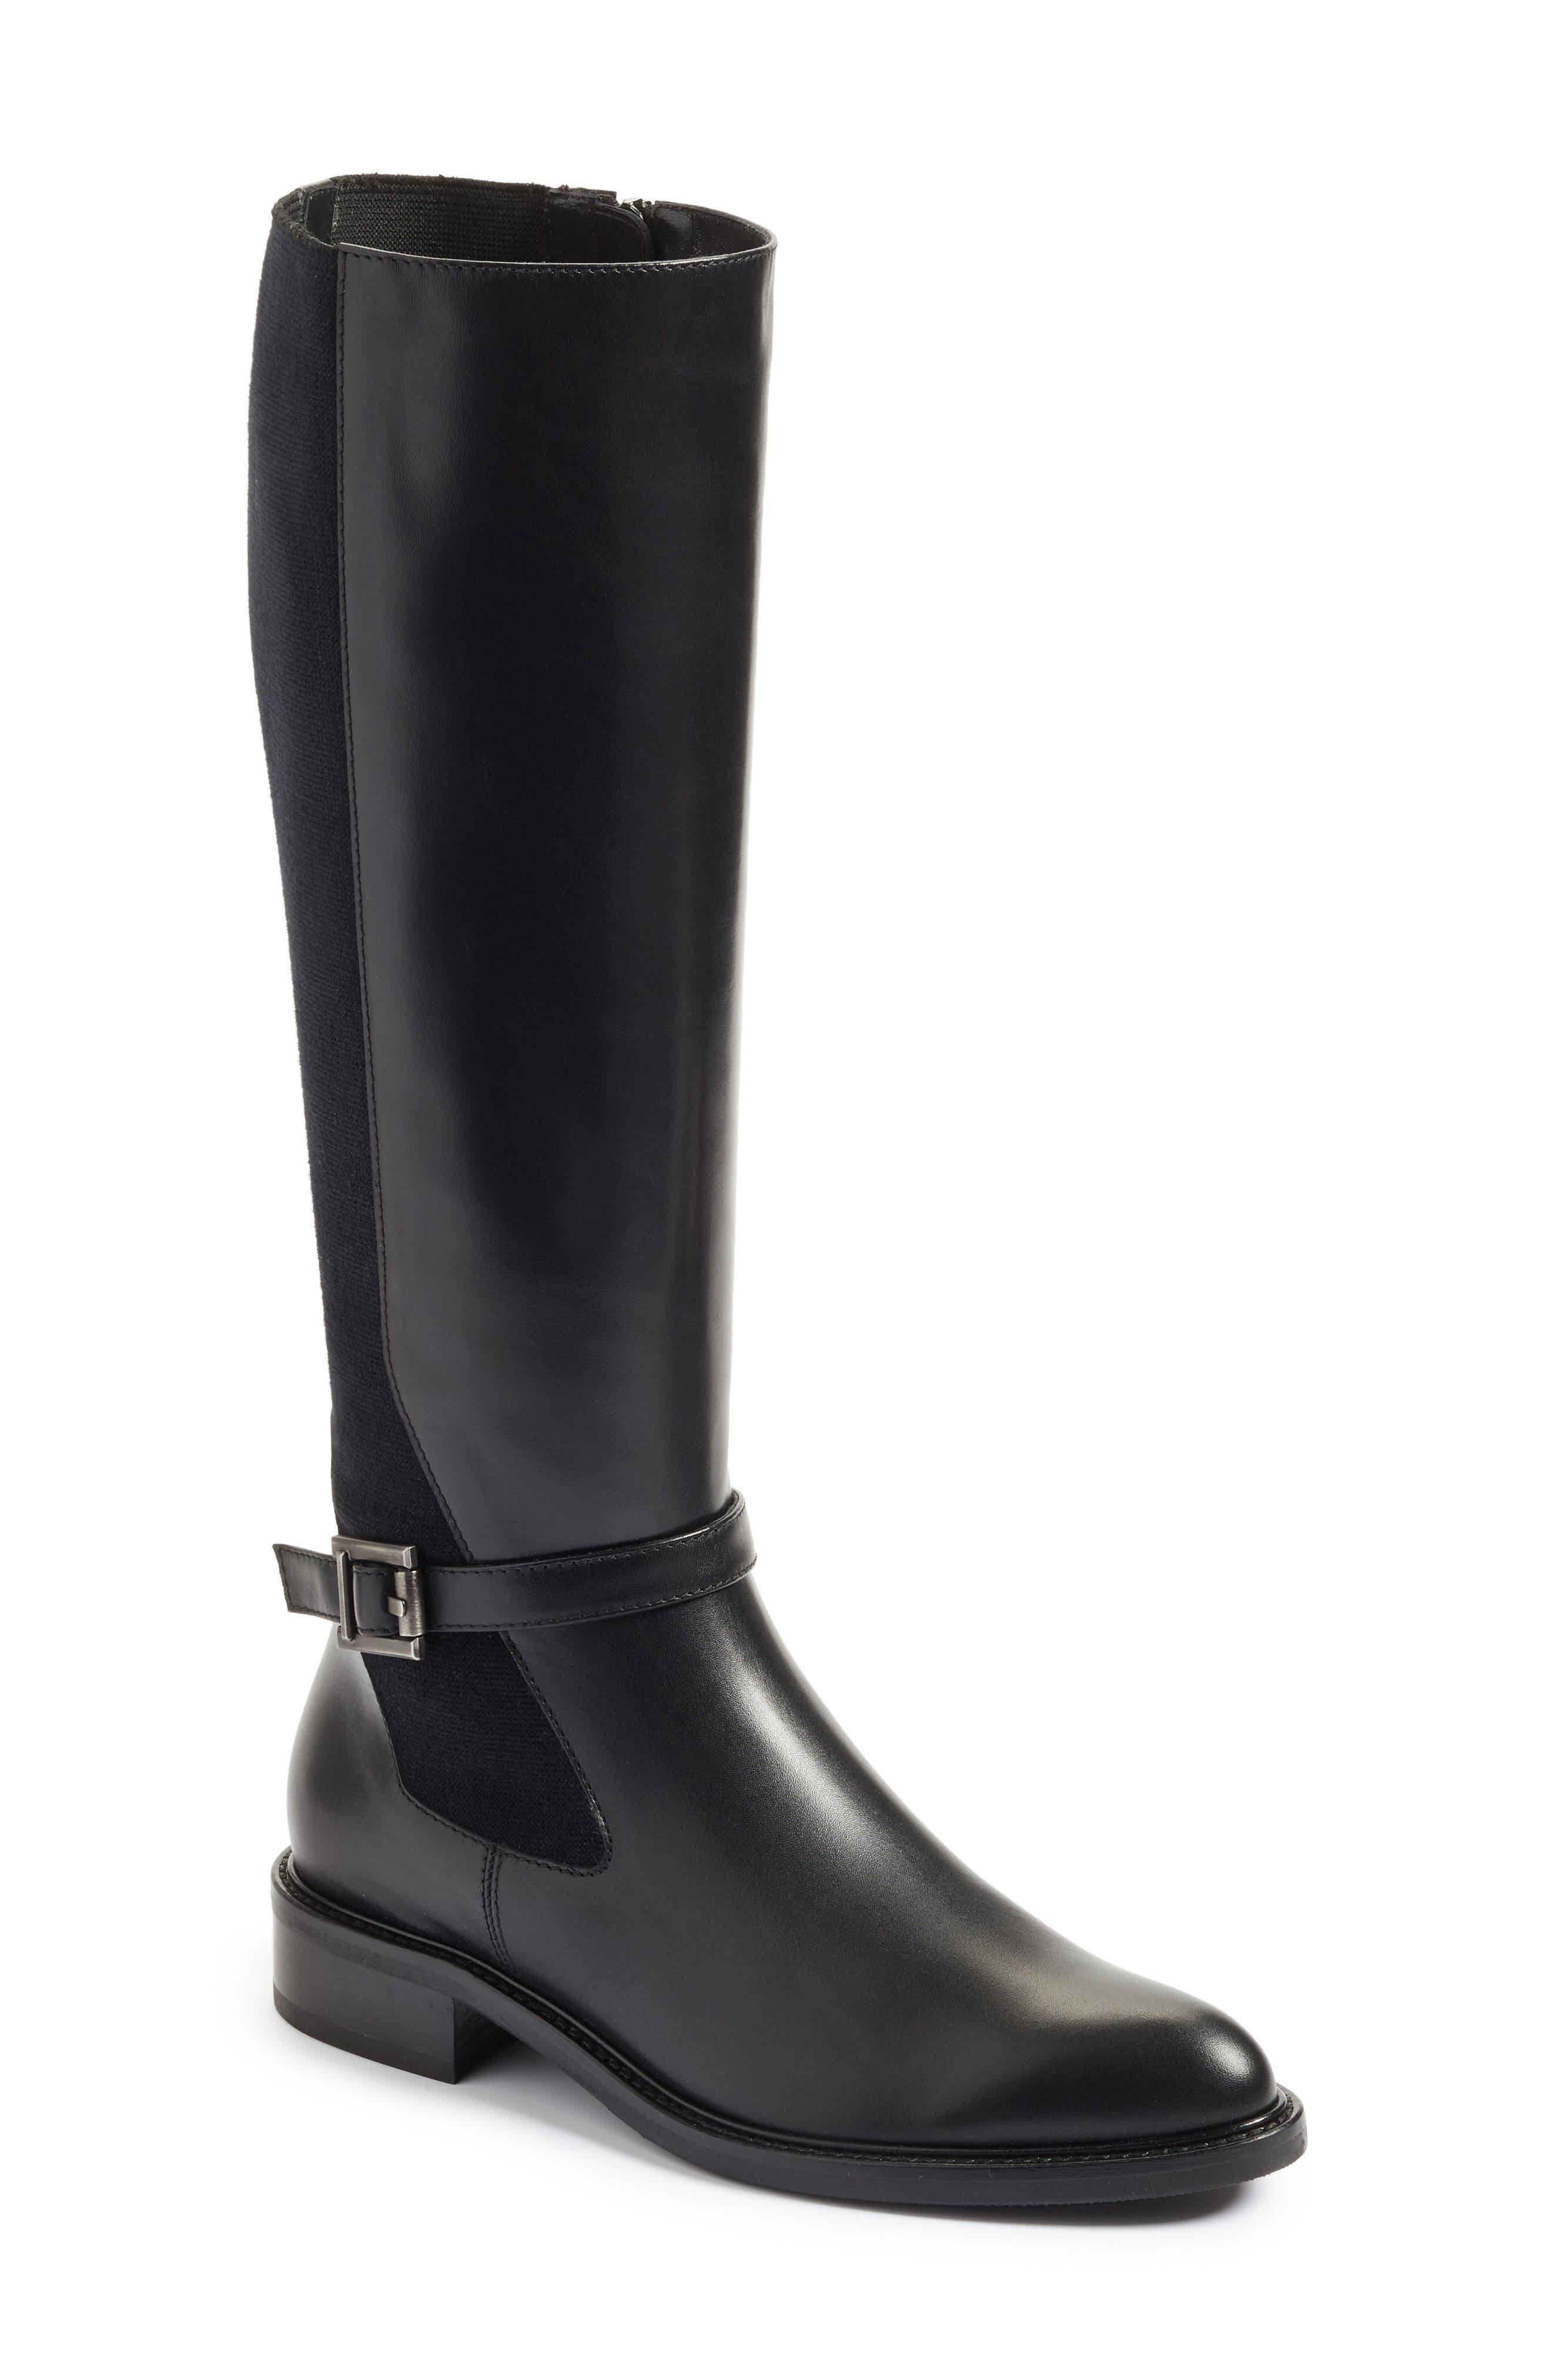 Genna Weatherproof Tall Boot,                         Main,                         color, Black Calf/ Elastic/ Suede